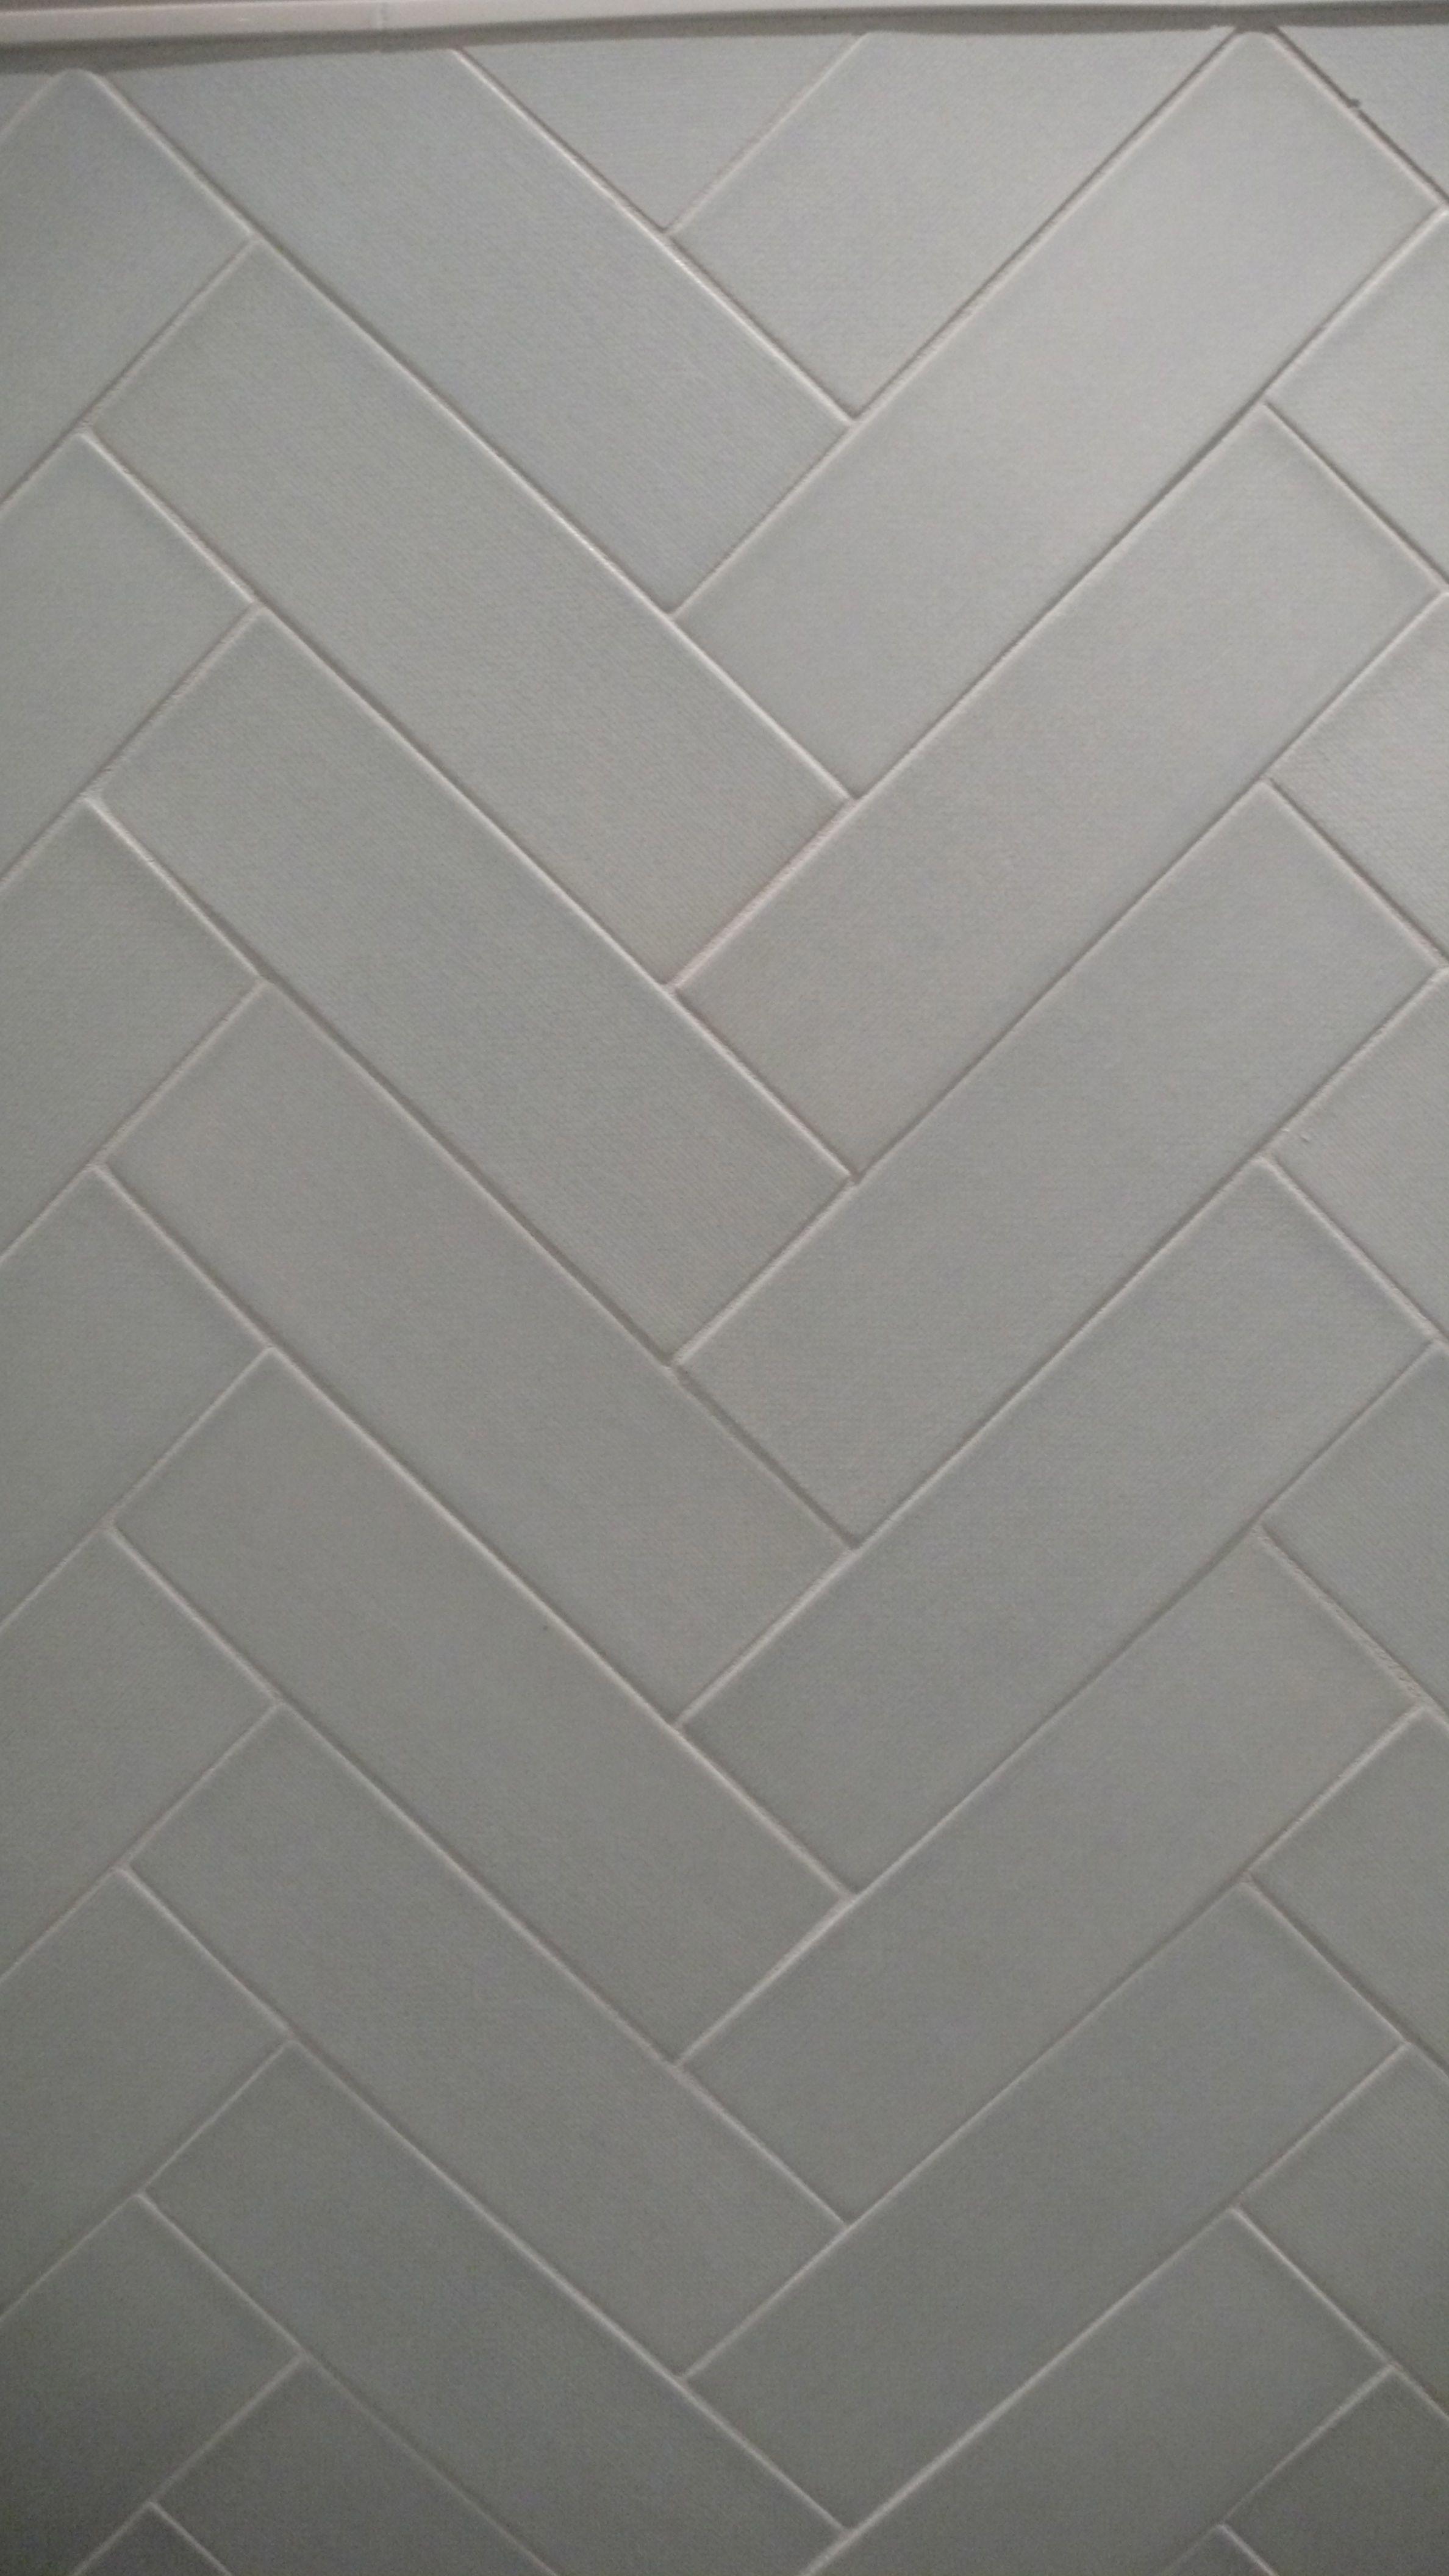 Field Tile 3 X 9 In Sea Laid Out In Herringbone Style Bathroom Decor Luxury Bathroom Decor Themes Herringbone Tile